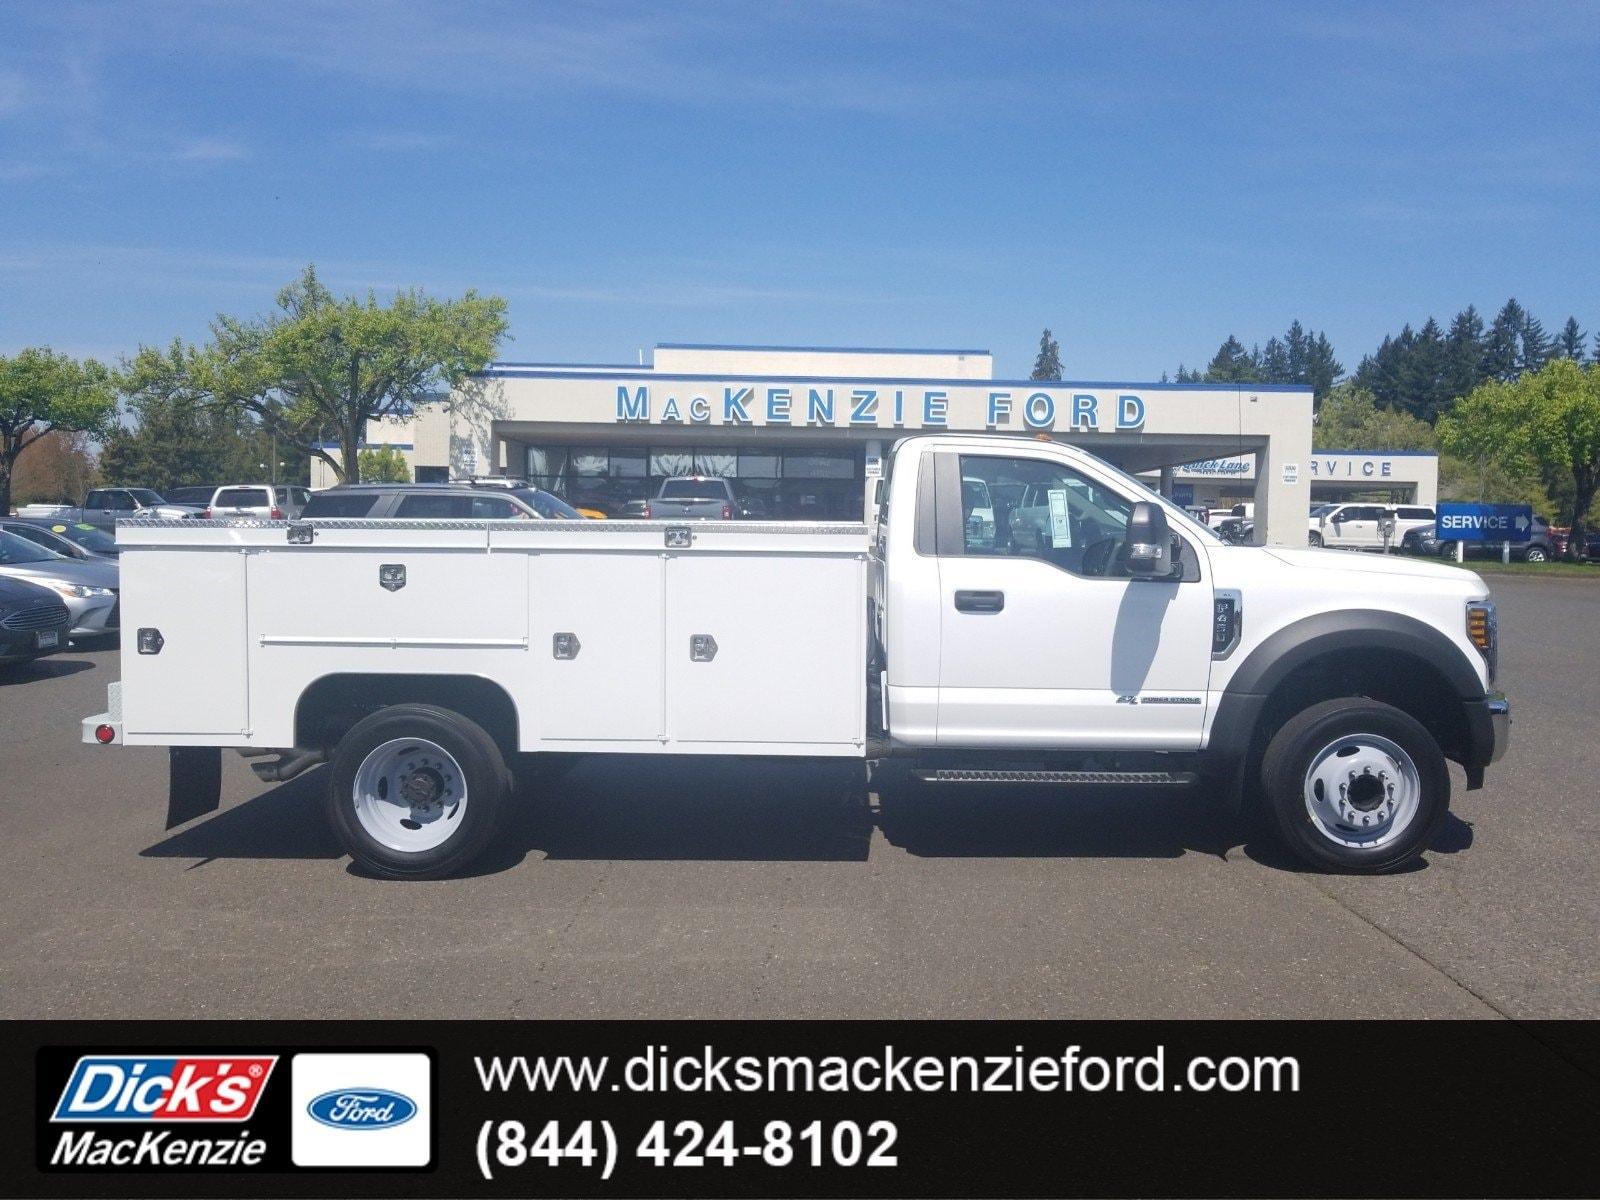 2019 Ford F-450 Regular Cab DRW 4x2, Scelzi Service Body #299683 - photo 1